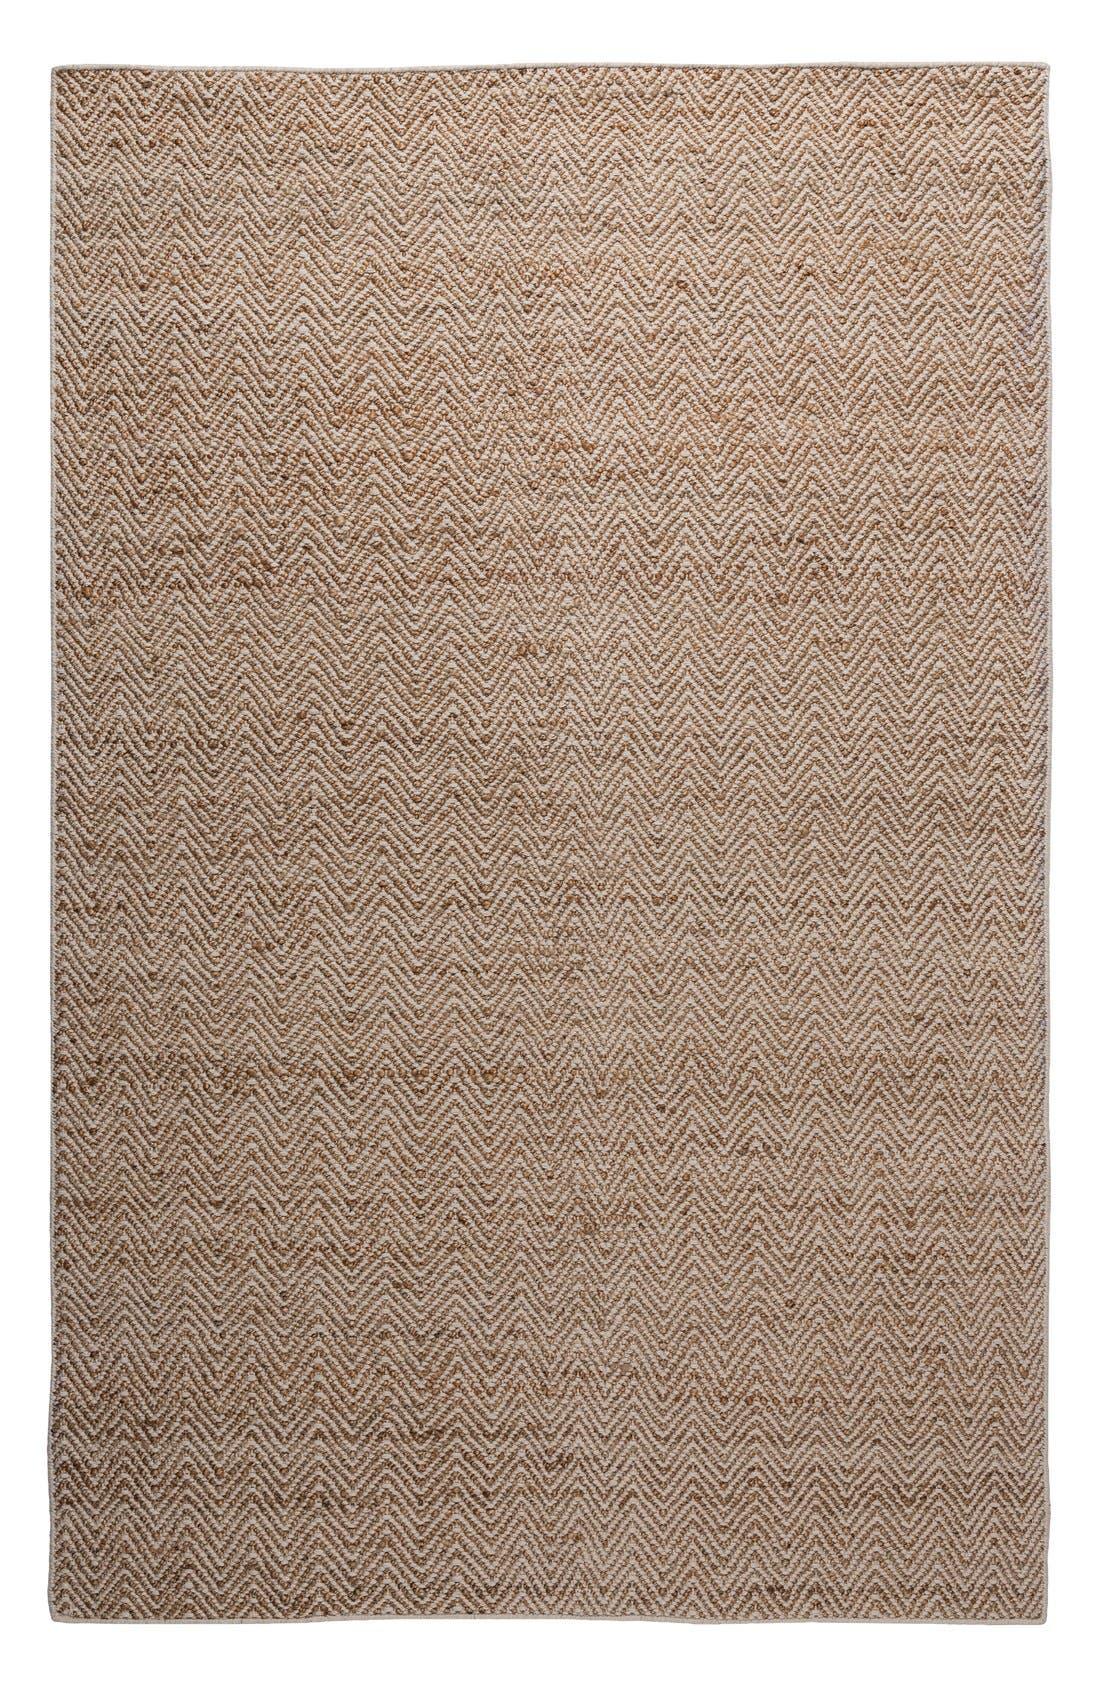 'Ellington' Hand Loomed Jute & Wool Area Rug,                             Main thumbnail 1, color,                             255